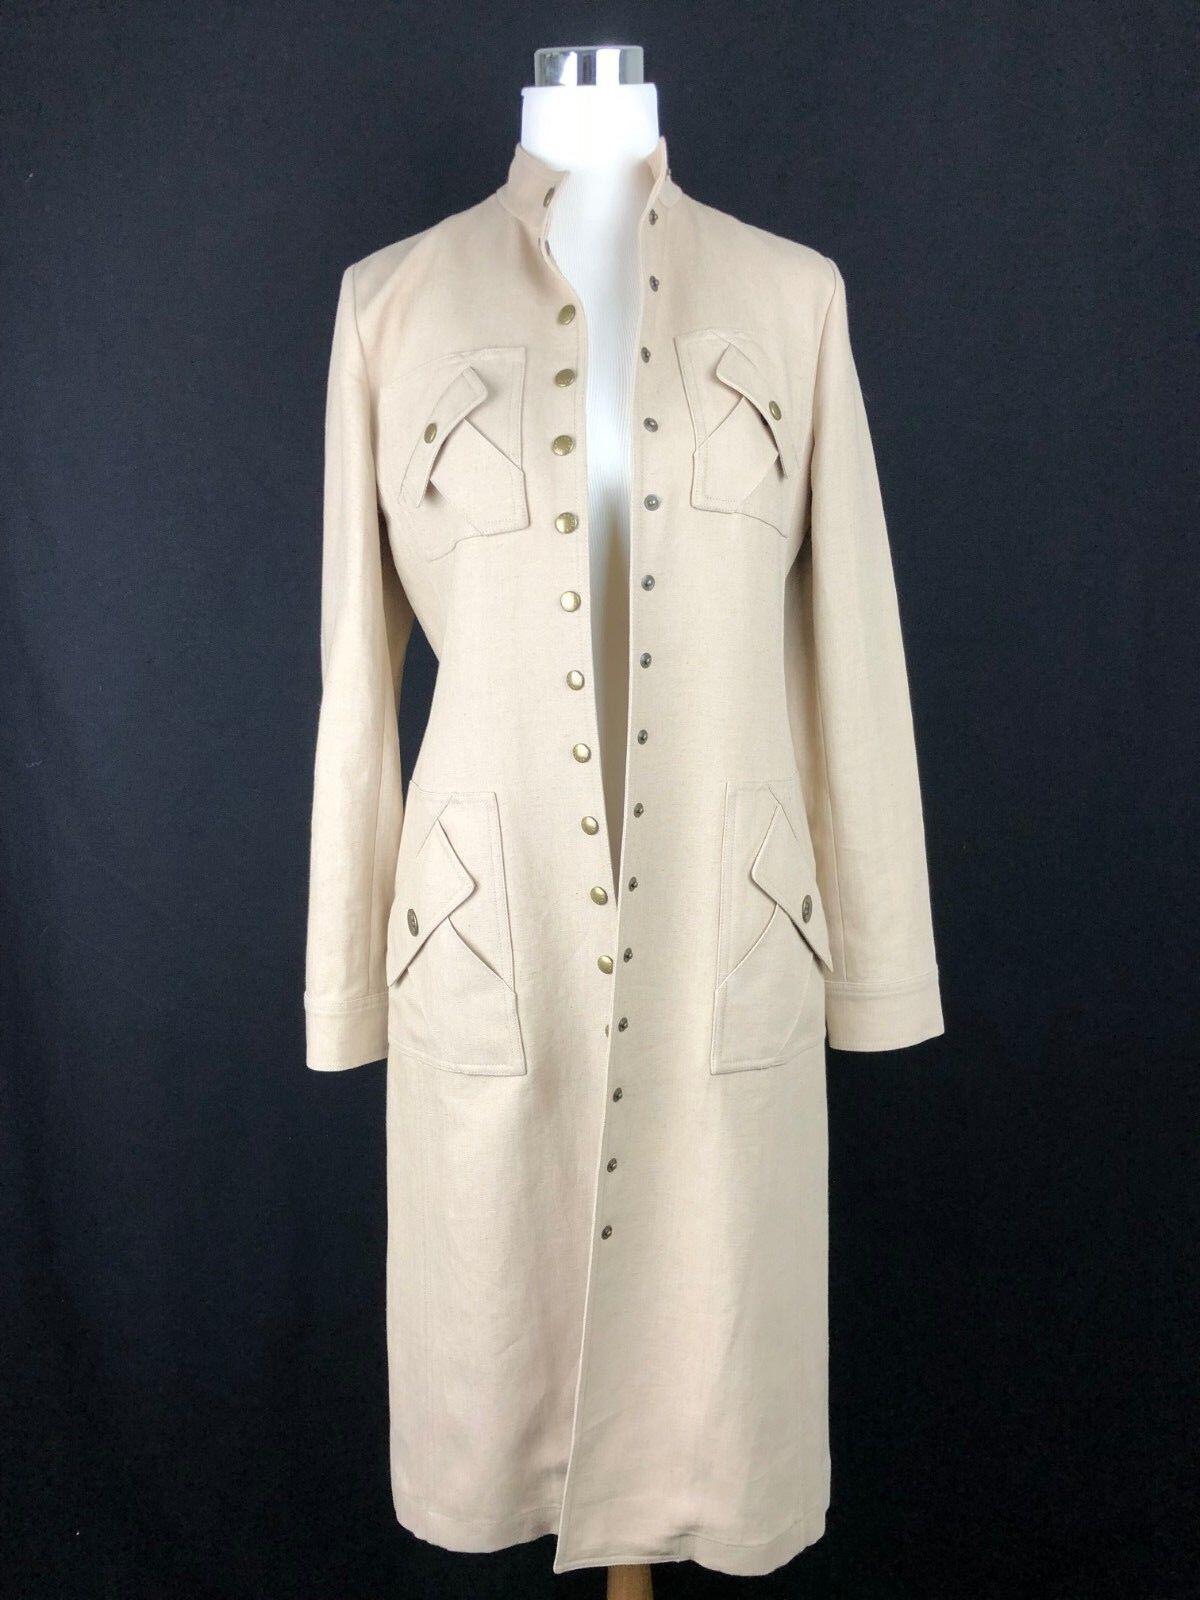 CELINE Runway Women's Tan Linen Coat Dress - Size 38 - US 8